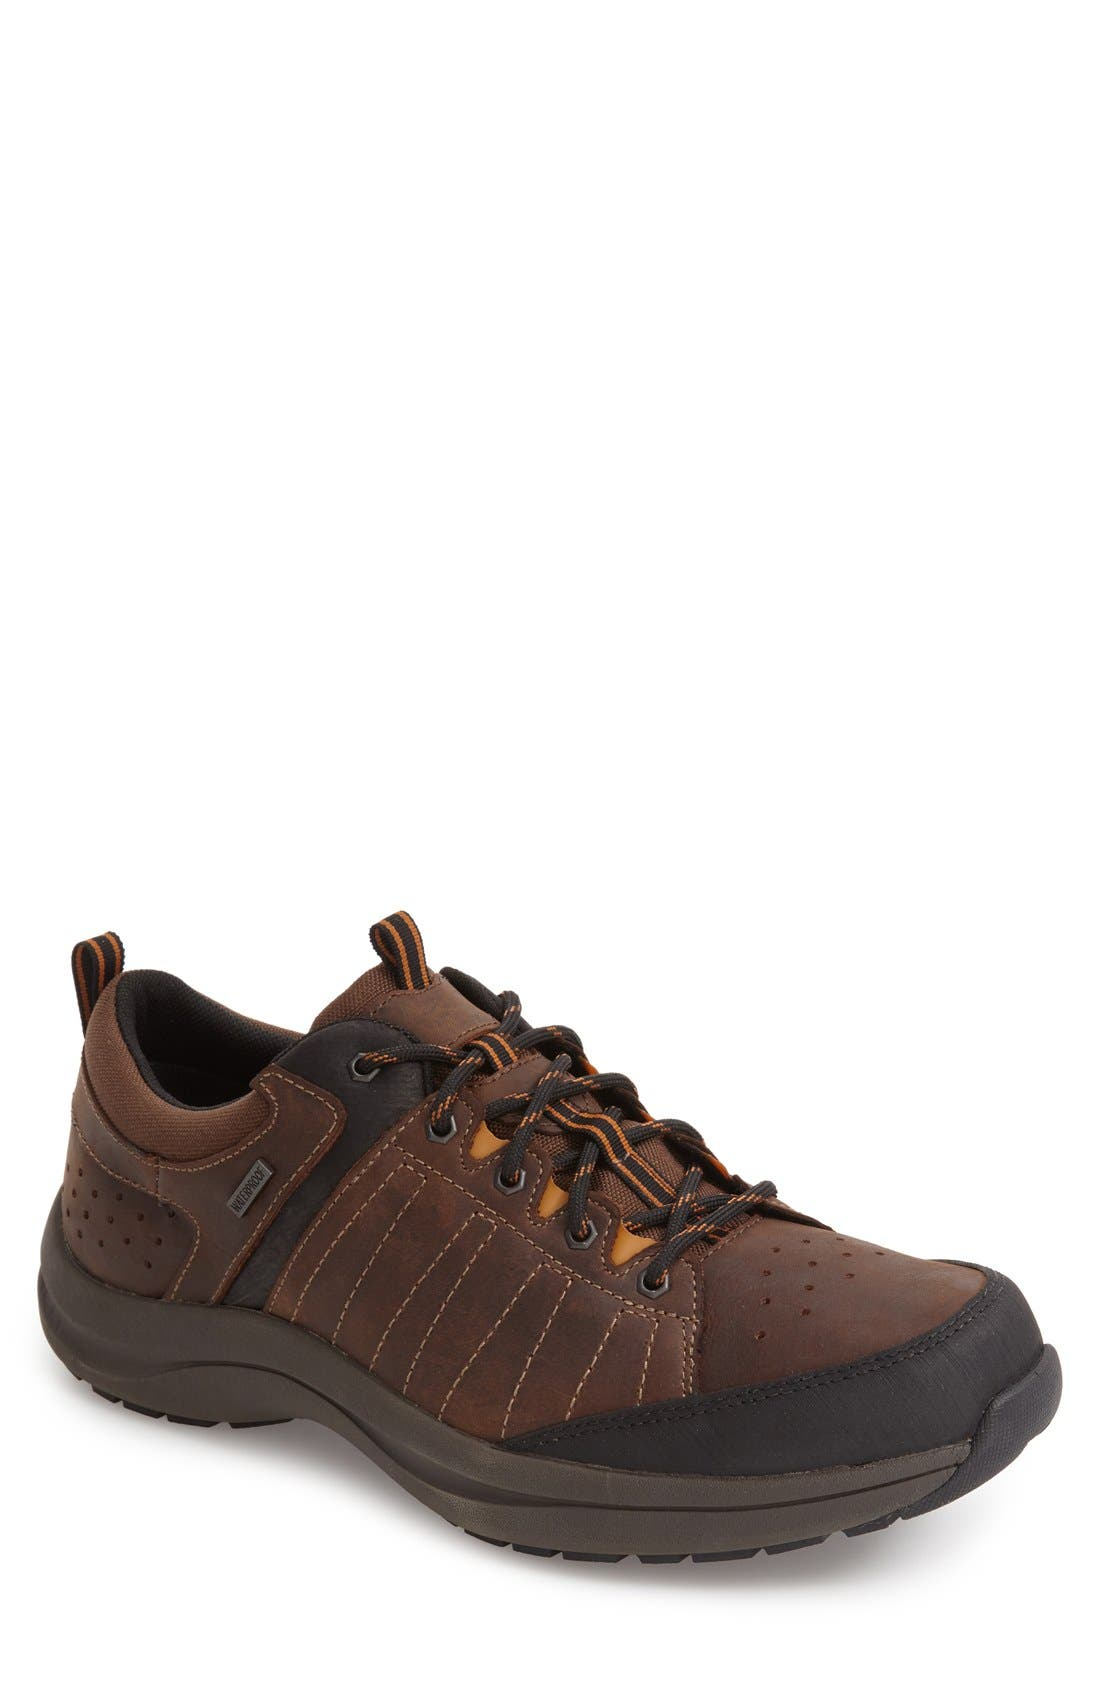 Dunham Seth-Dun Waterproof Sneaker (Men)